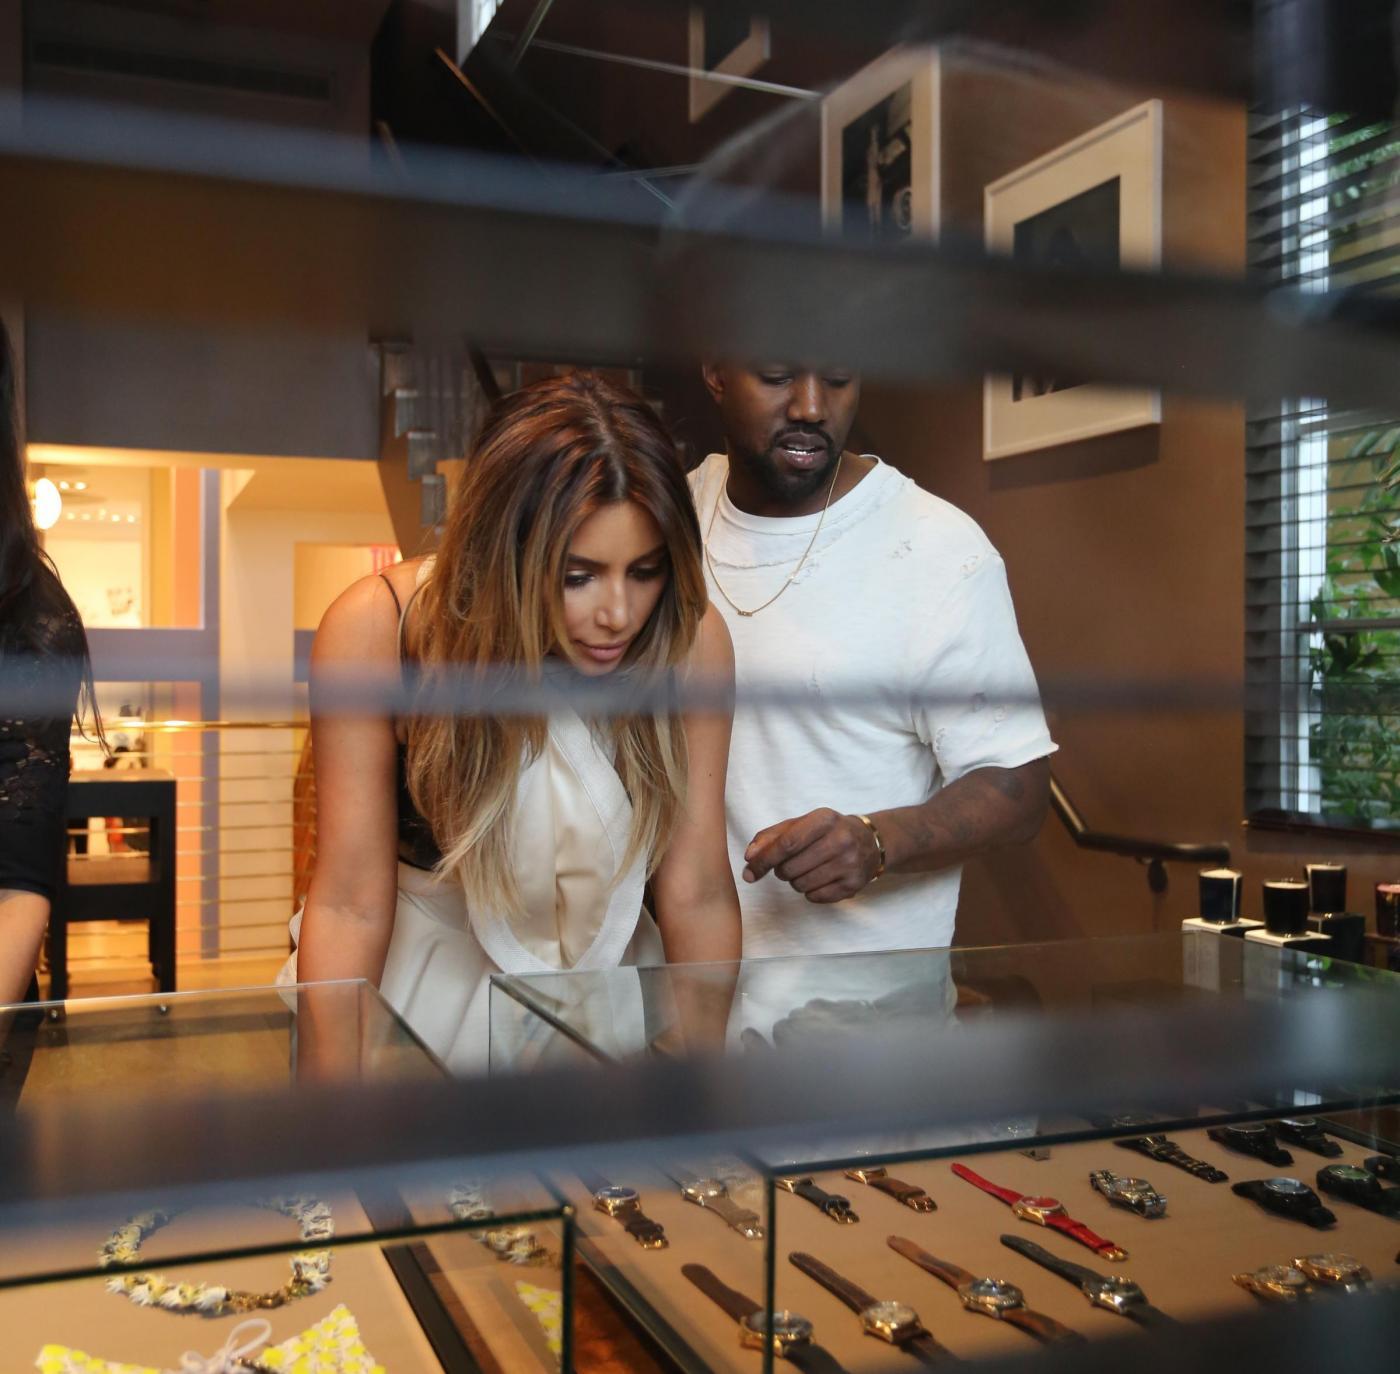 Kim Kardashian e Kanye West, shopping a Miami il giorno del black friday06